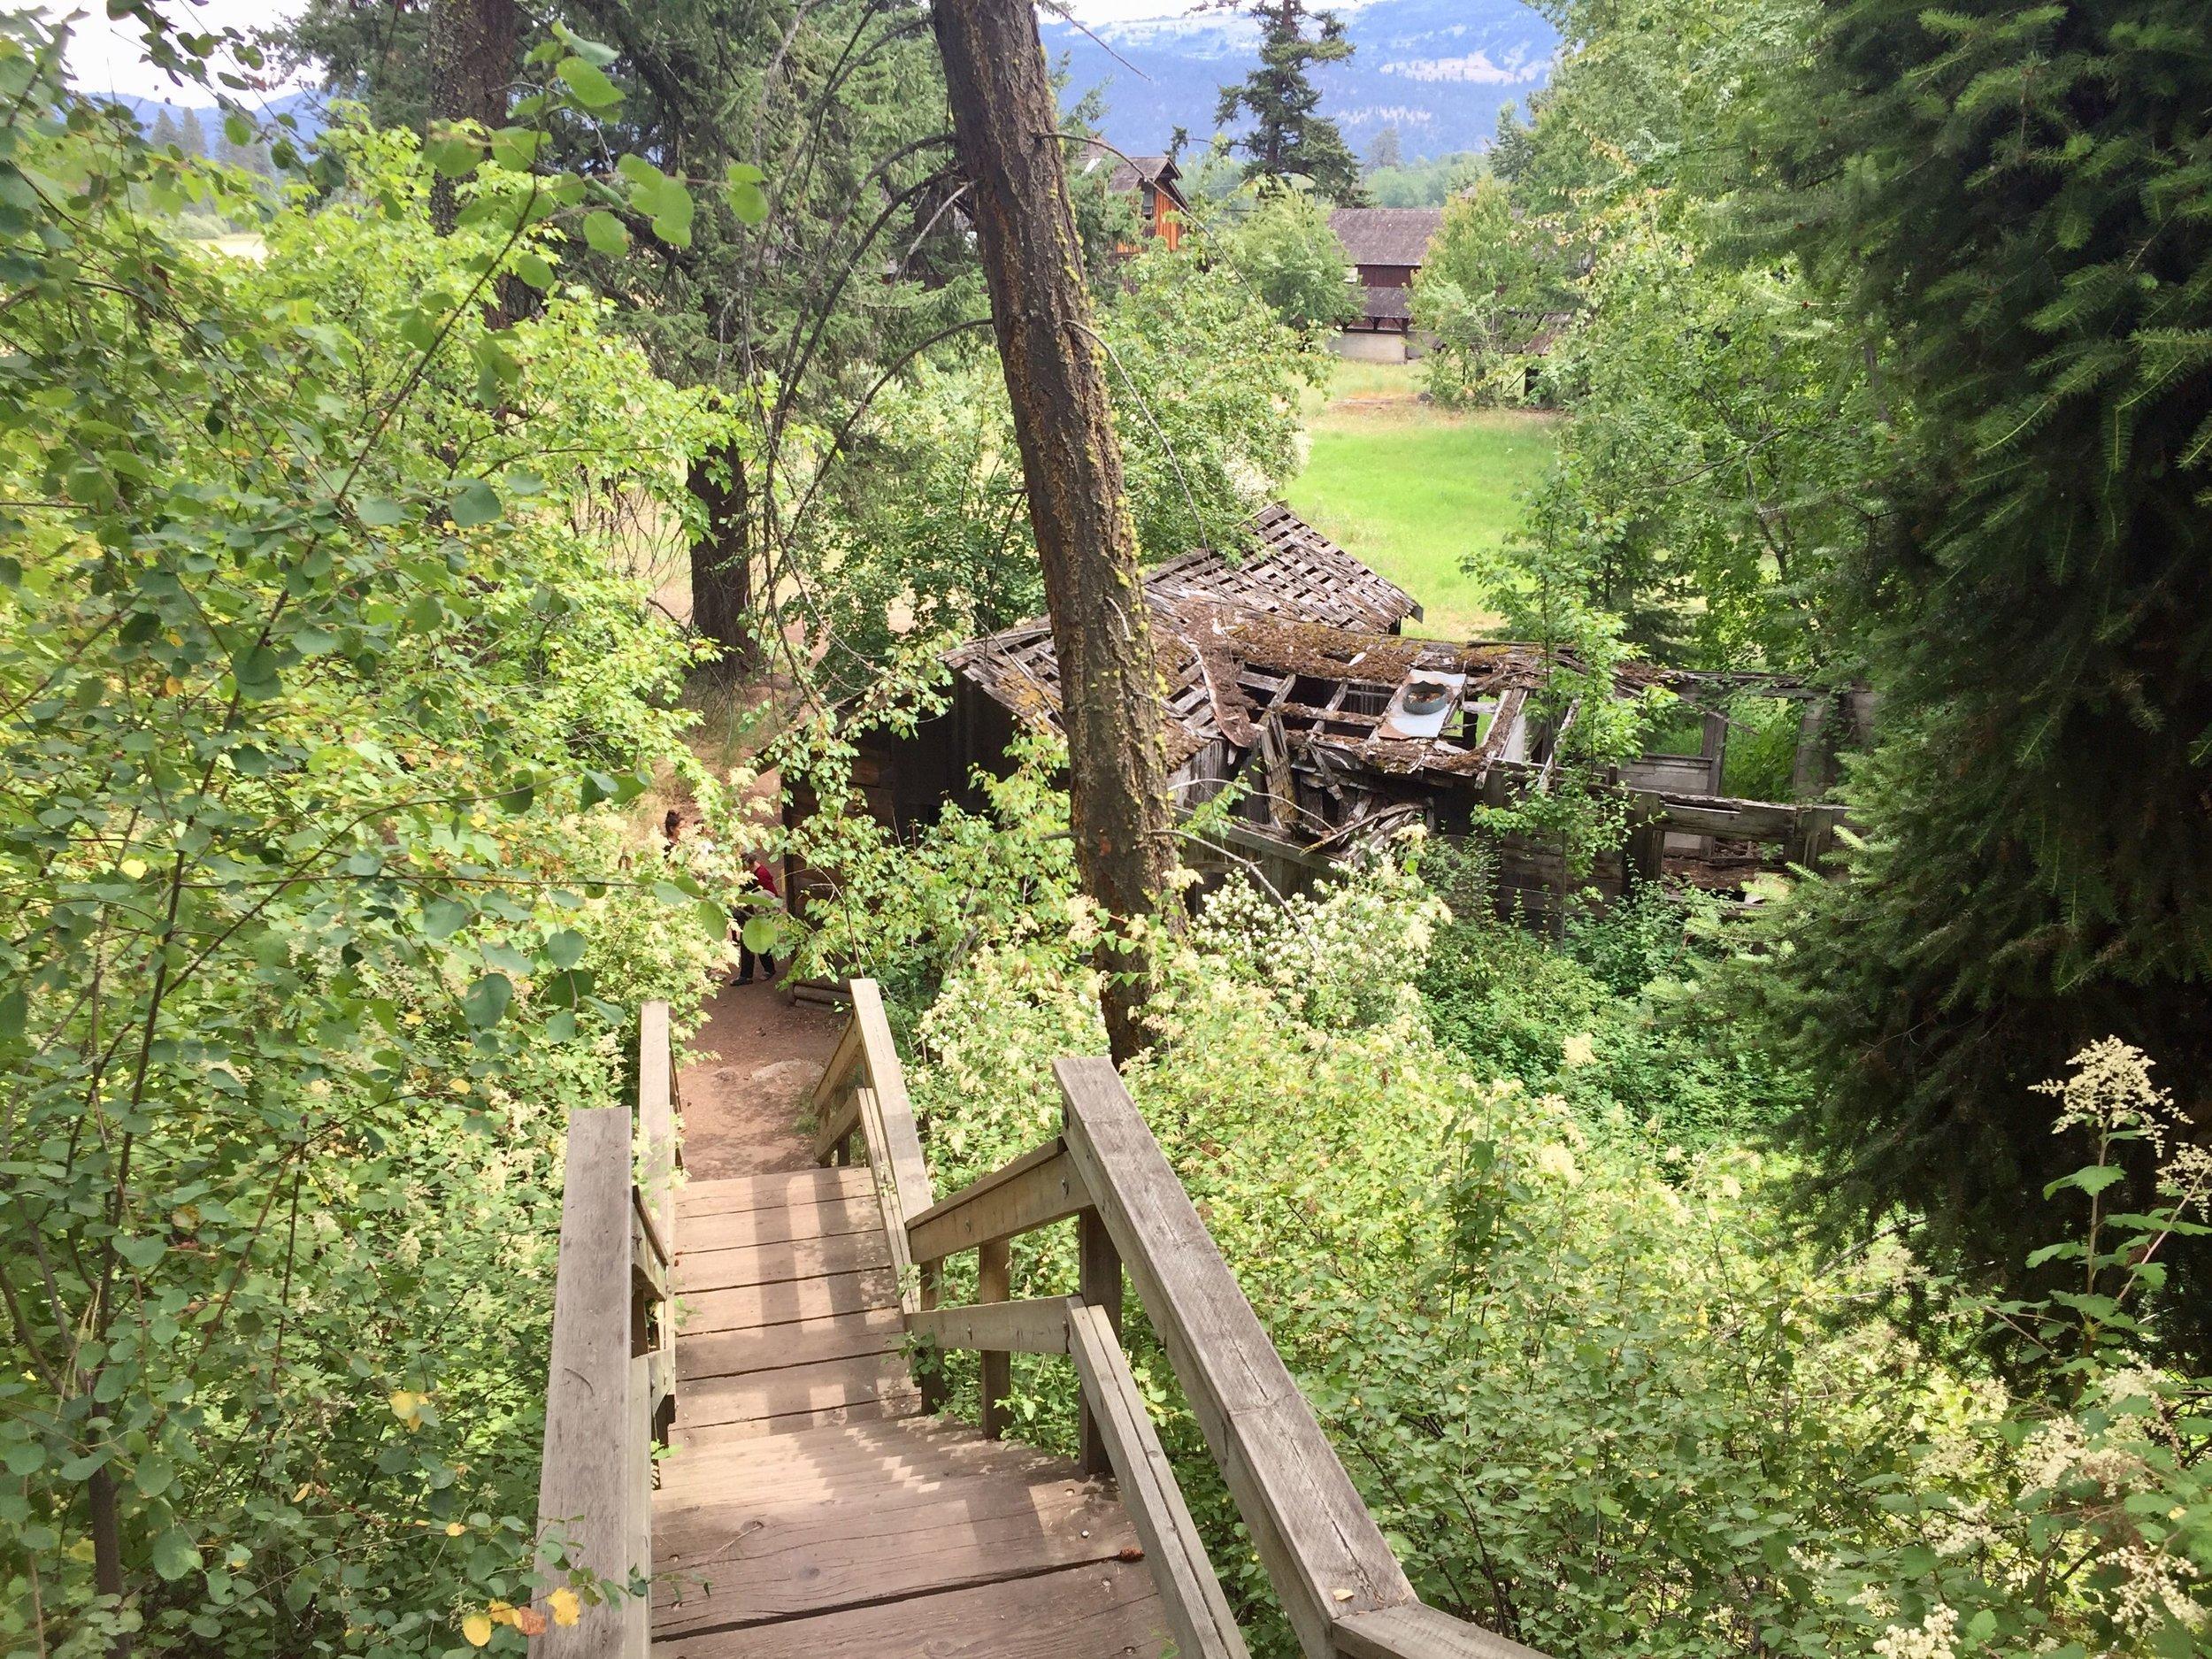 fintry-falls-provincial-park-okanagan-british columbia-canada.jpg